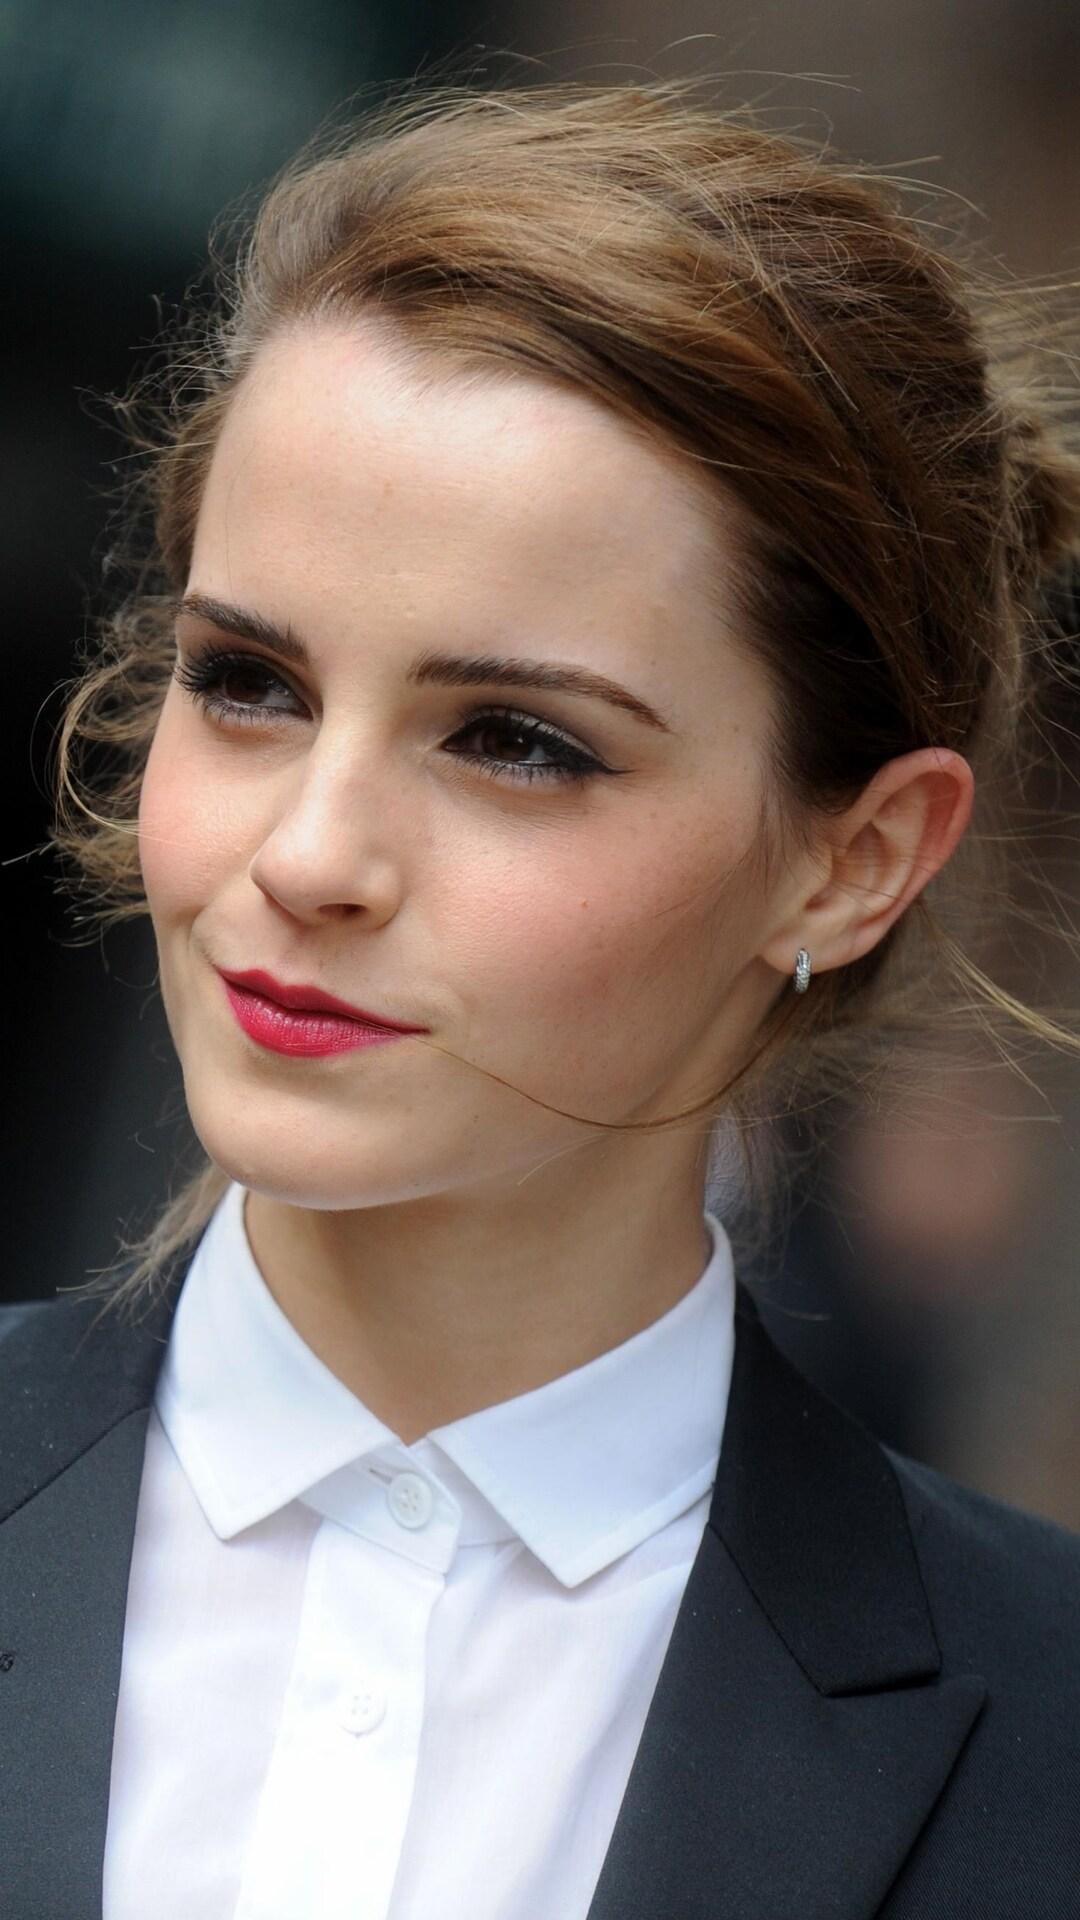 1080x1920 Emma Watson 13 Iphone 7,6s,6 Plus, Pixel xl ,One ...